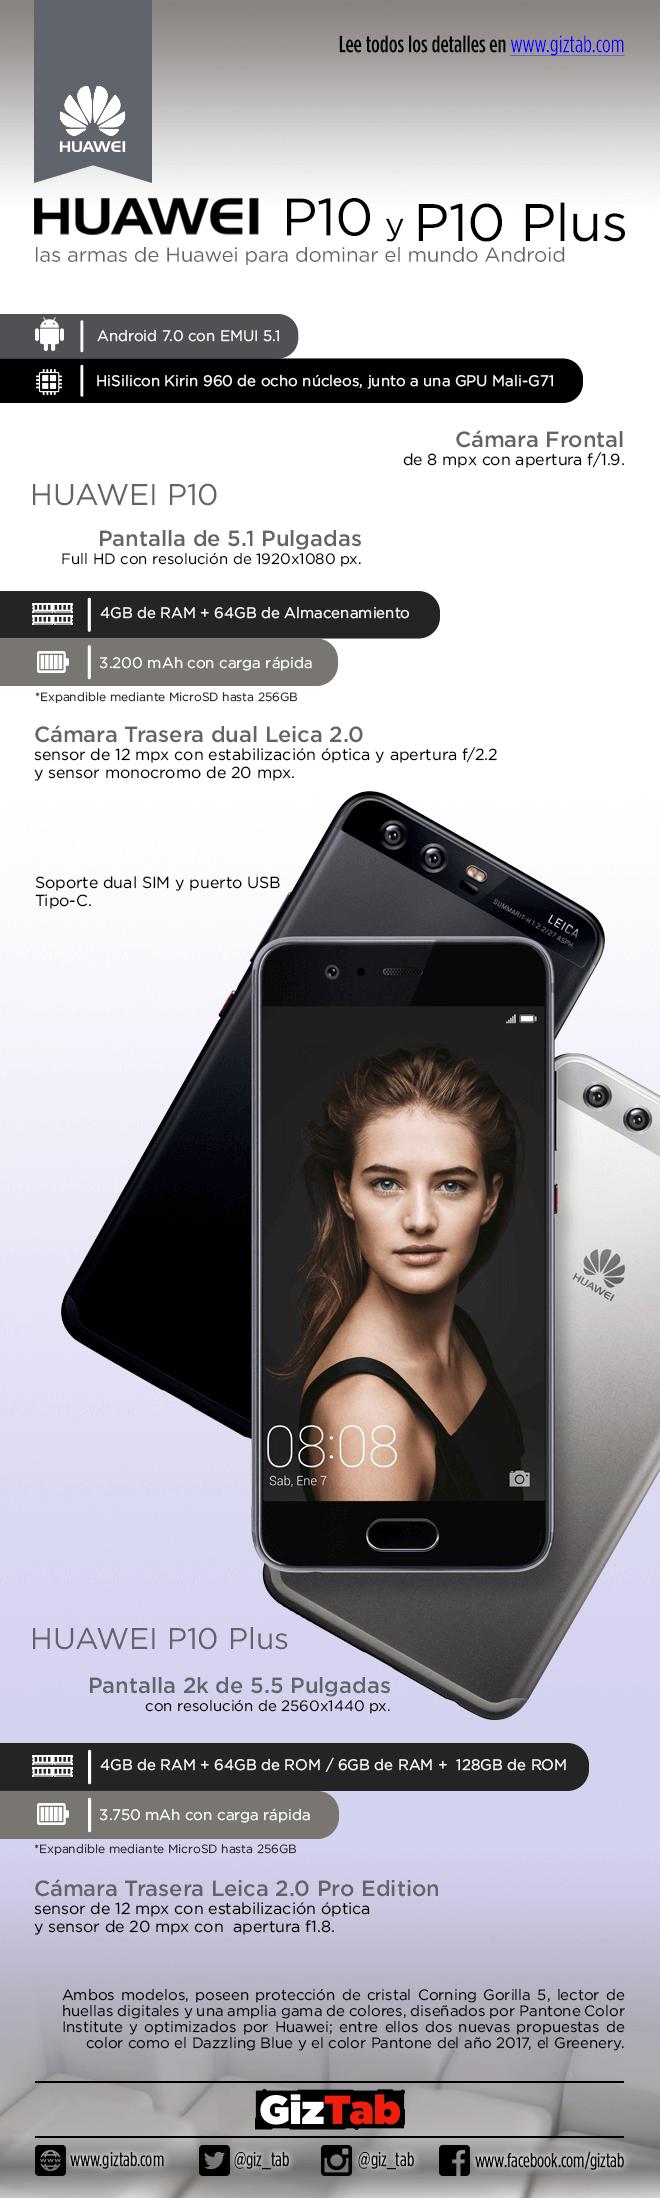 Huawei P10 Vs Huawei P10 Plus infografia